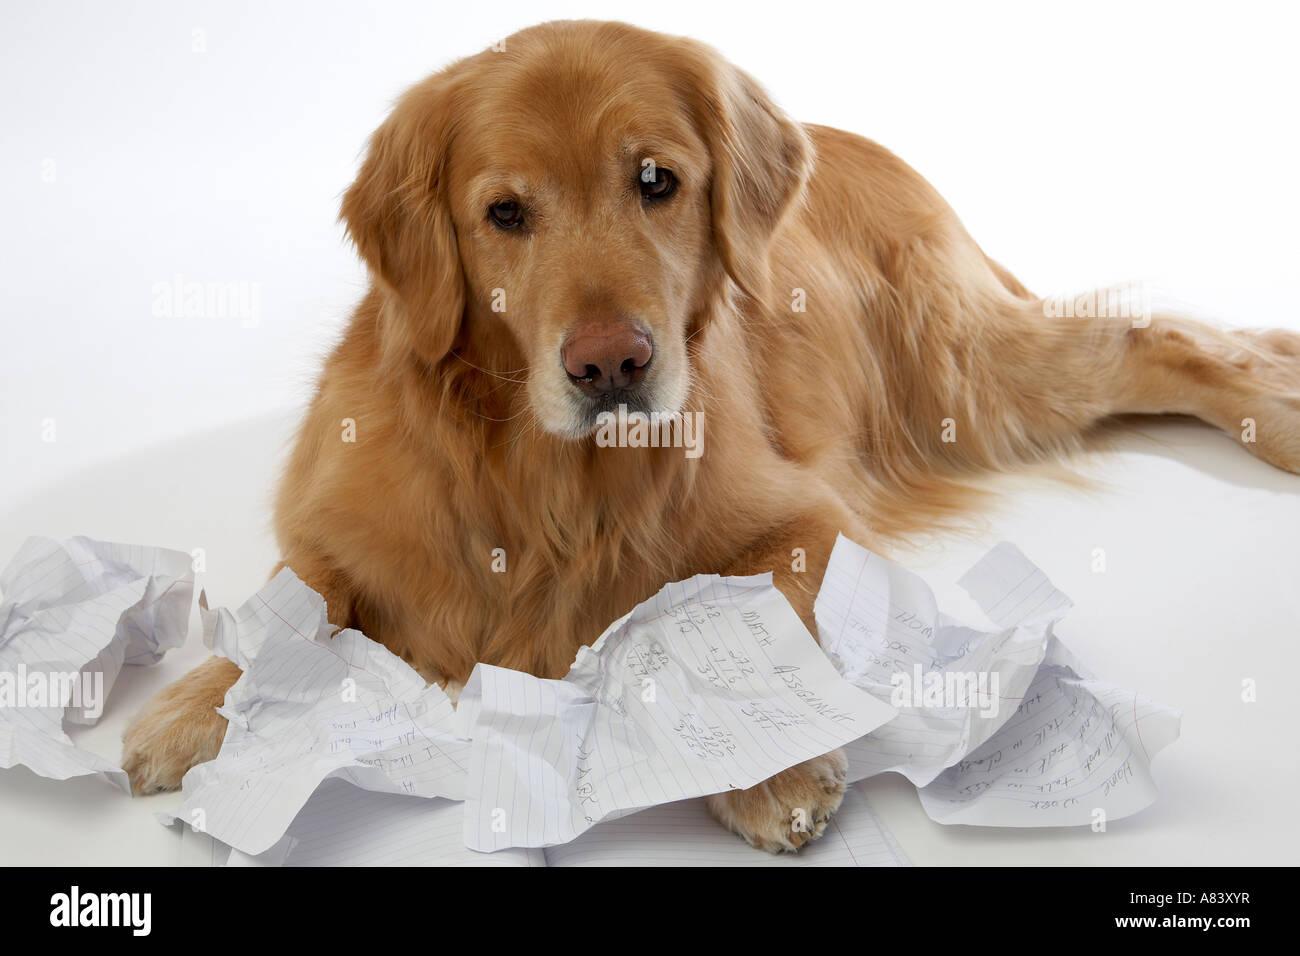 Dog Eat Homework